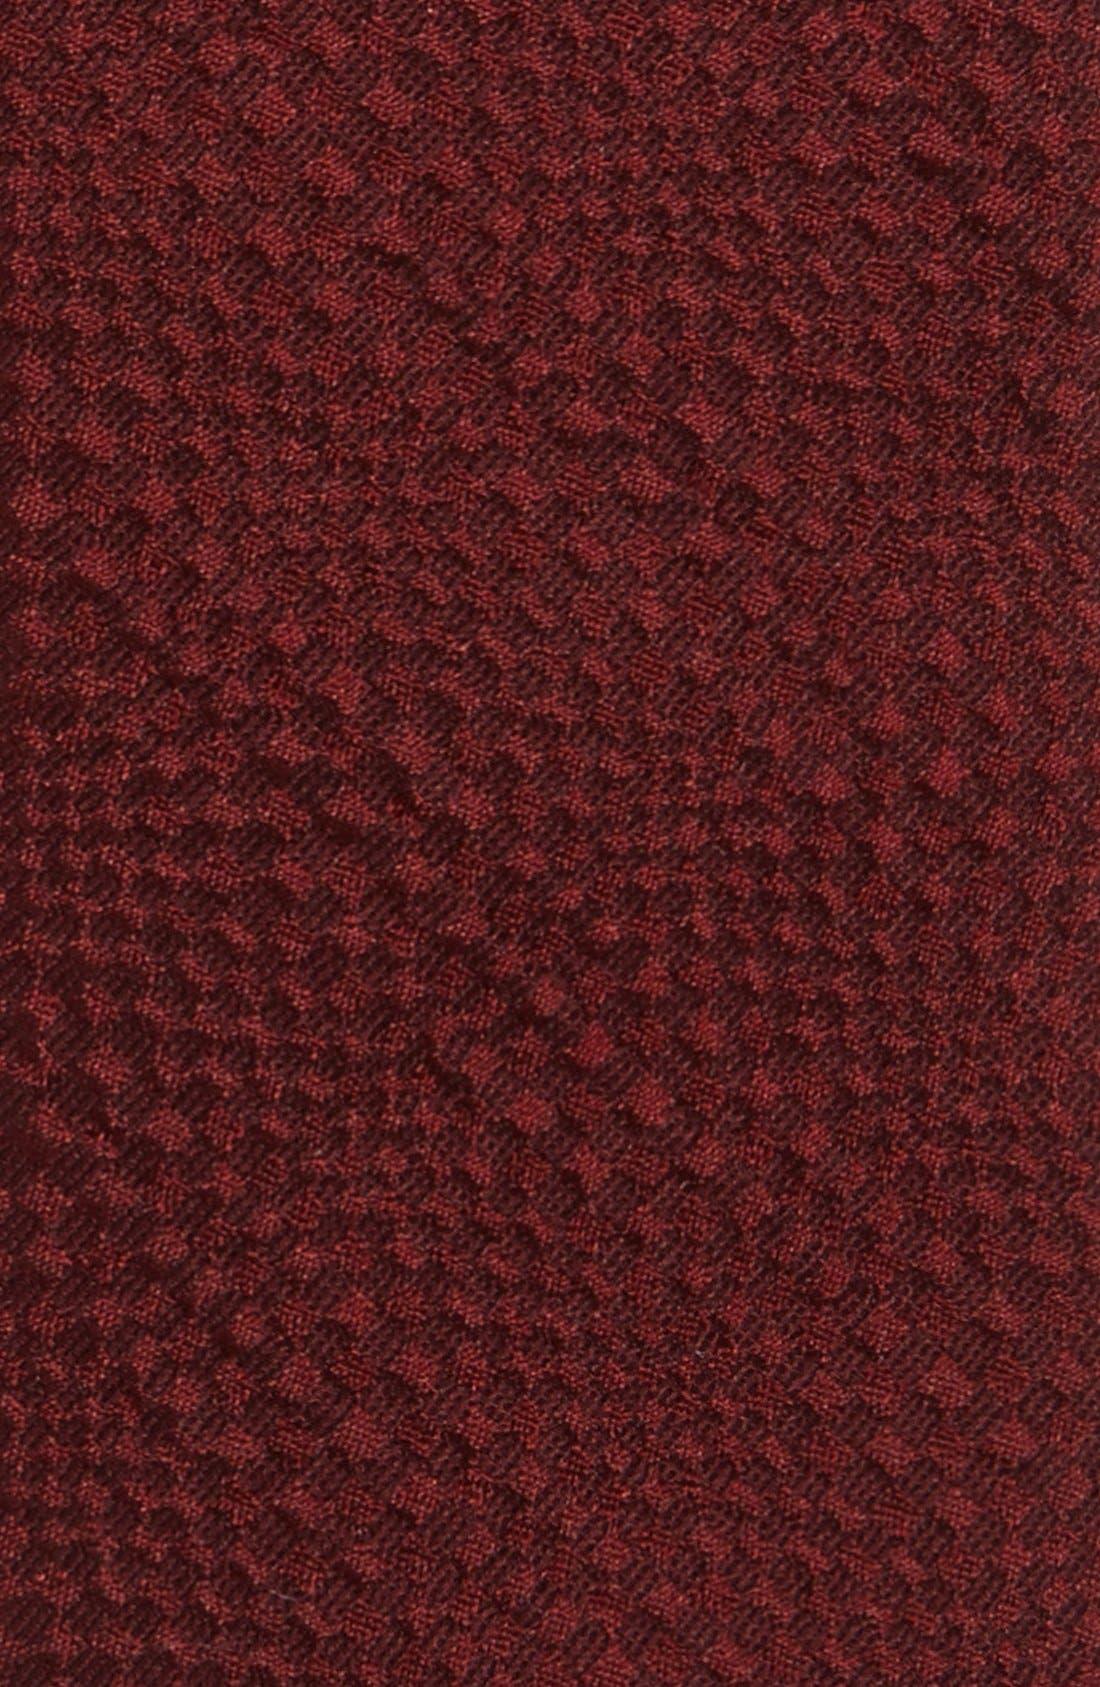 Alternate Image 2  - Lanvin Textured Woven Tie